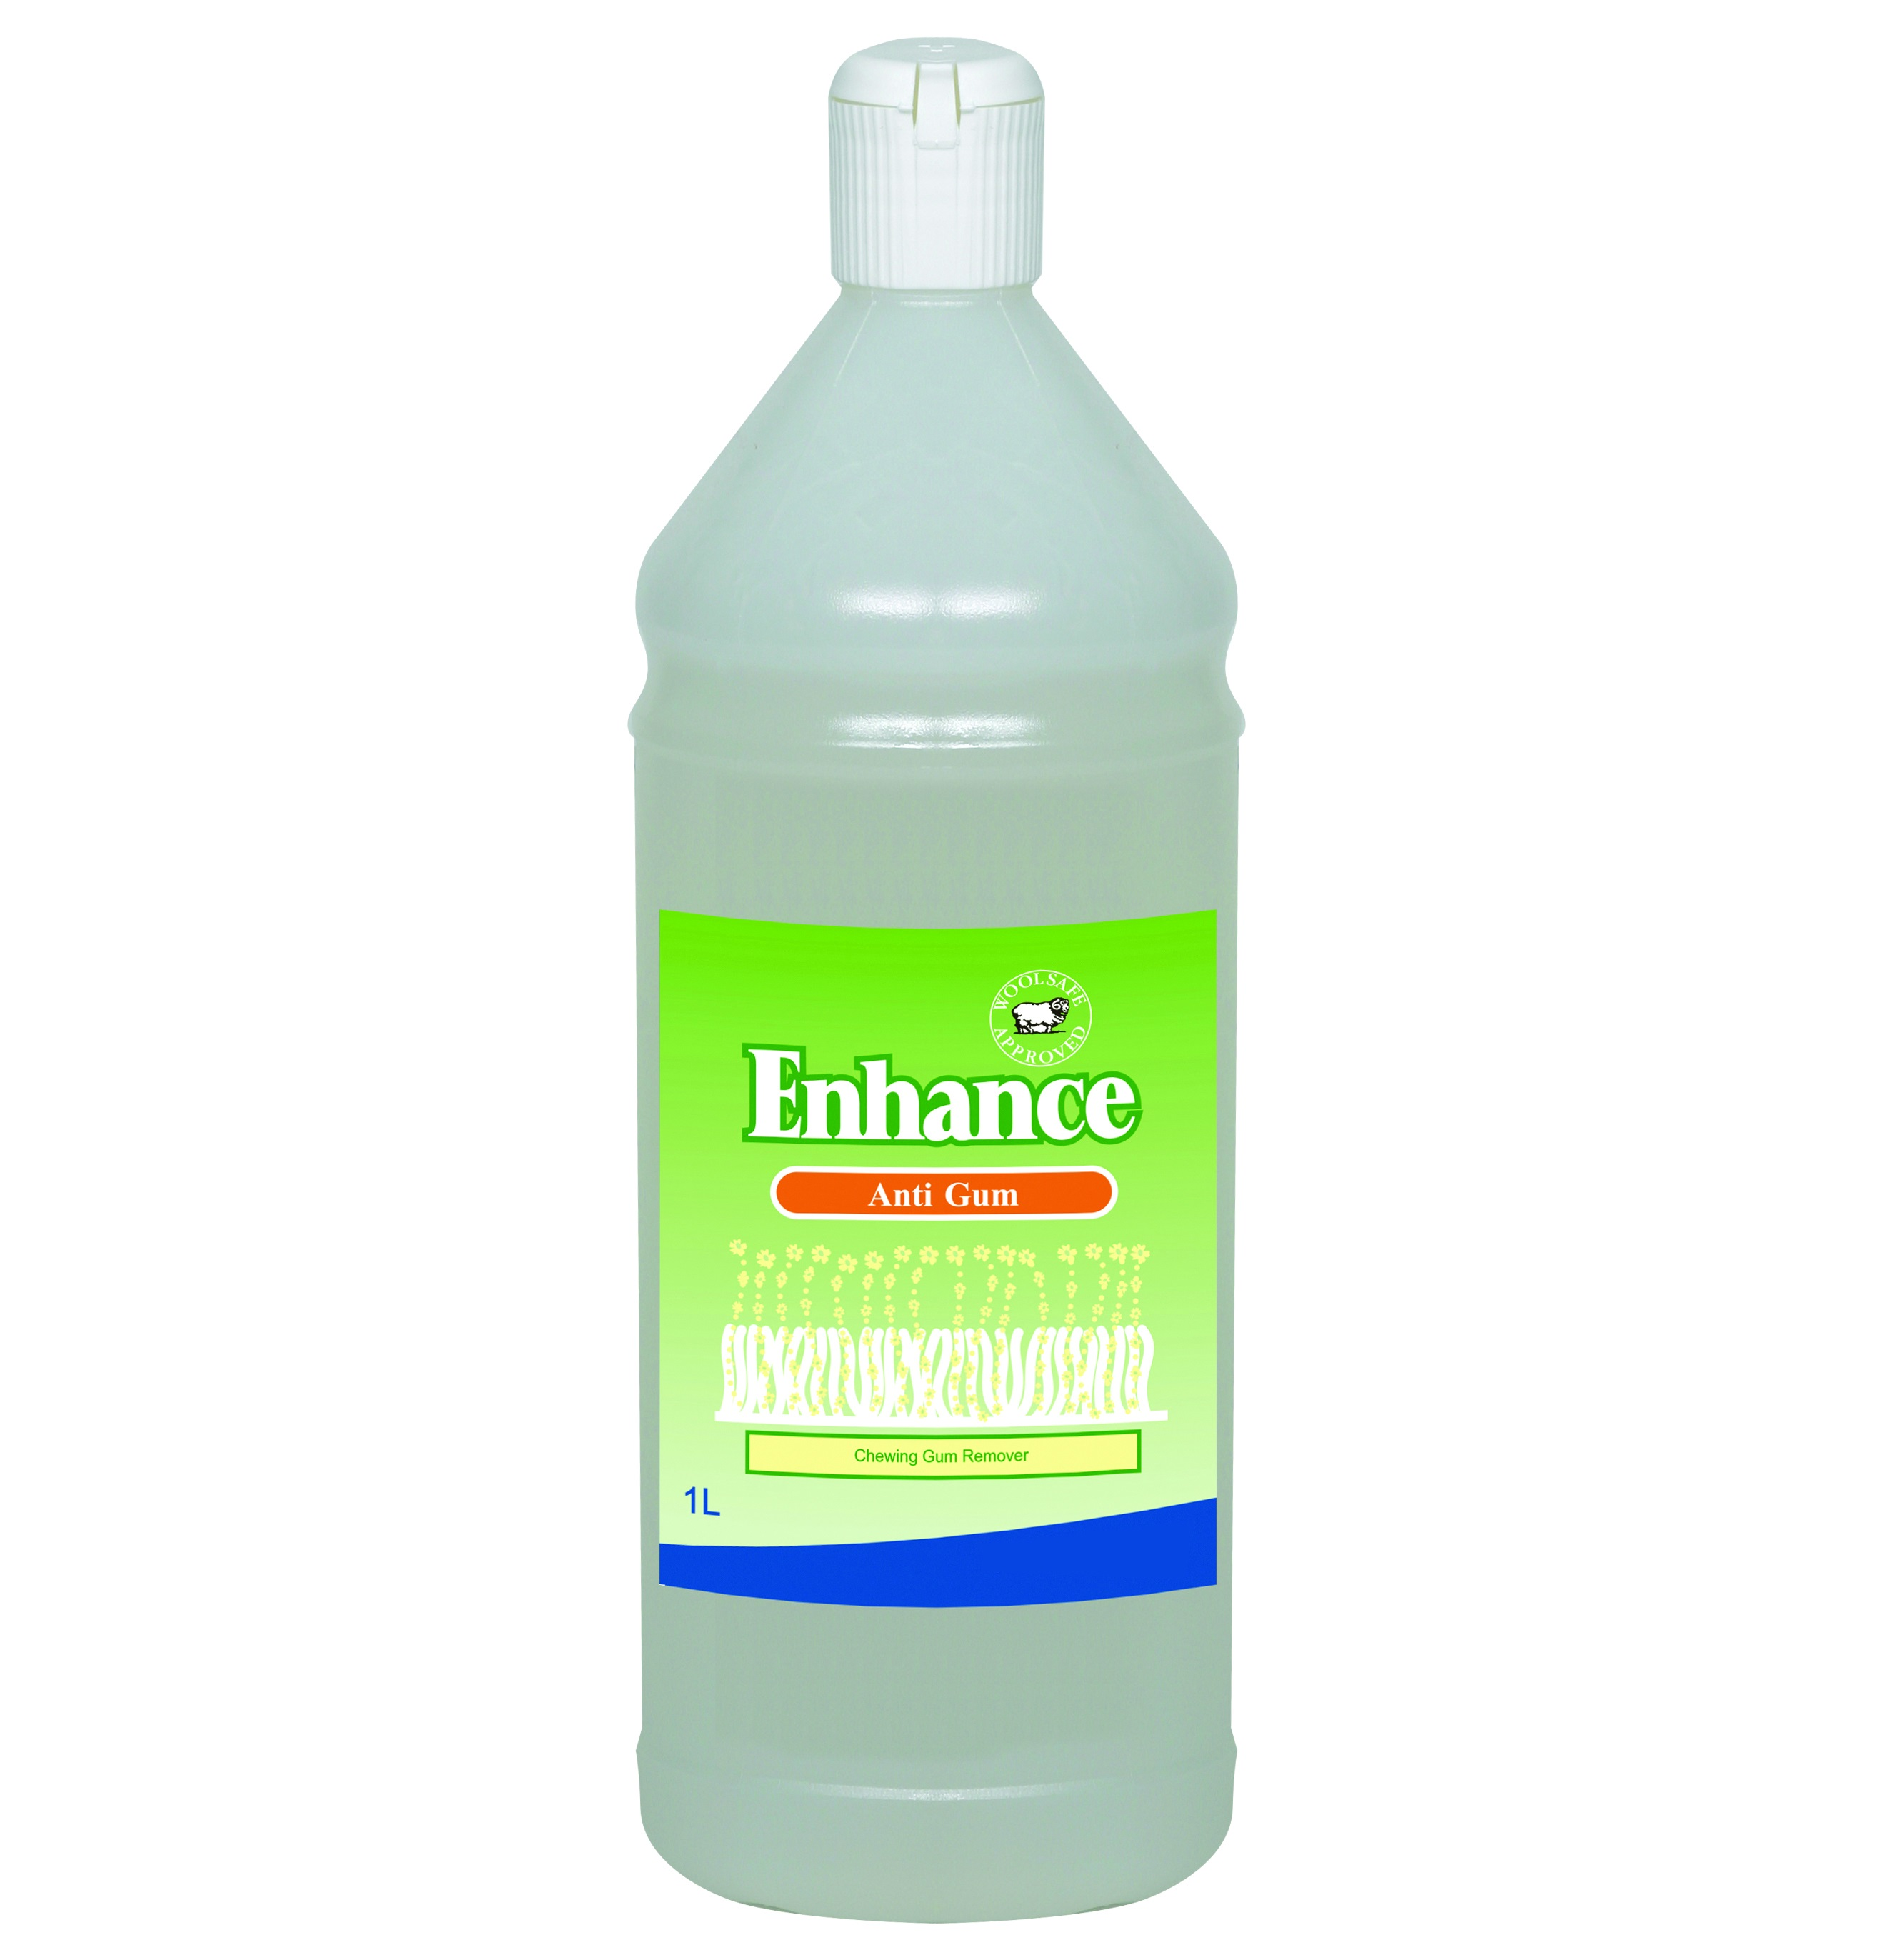 Anti-Gum-12x1litre